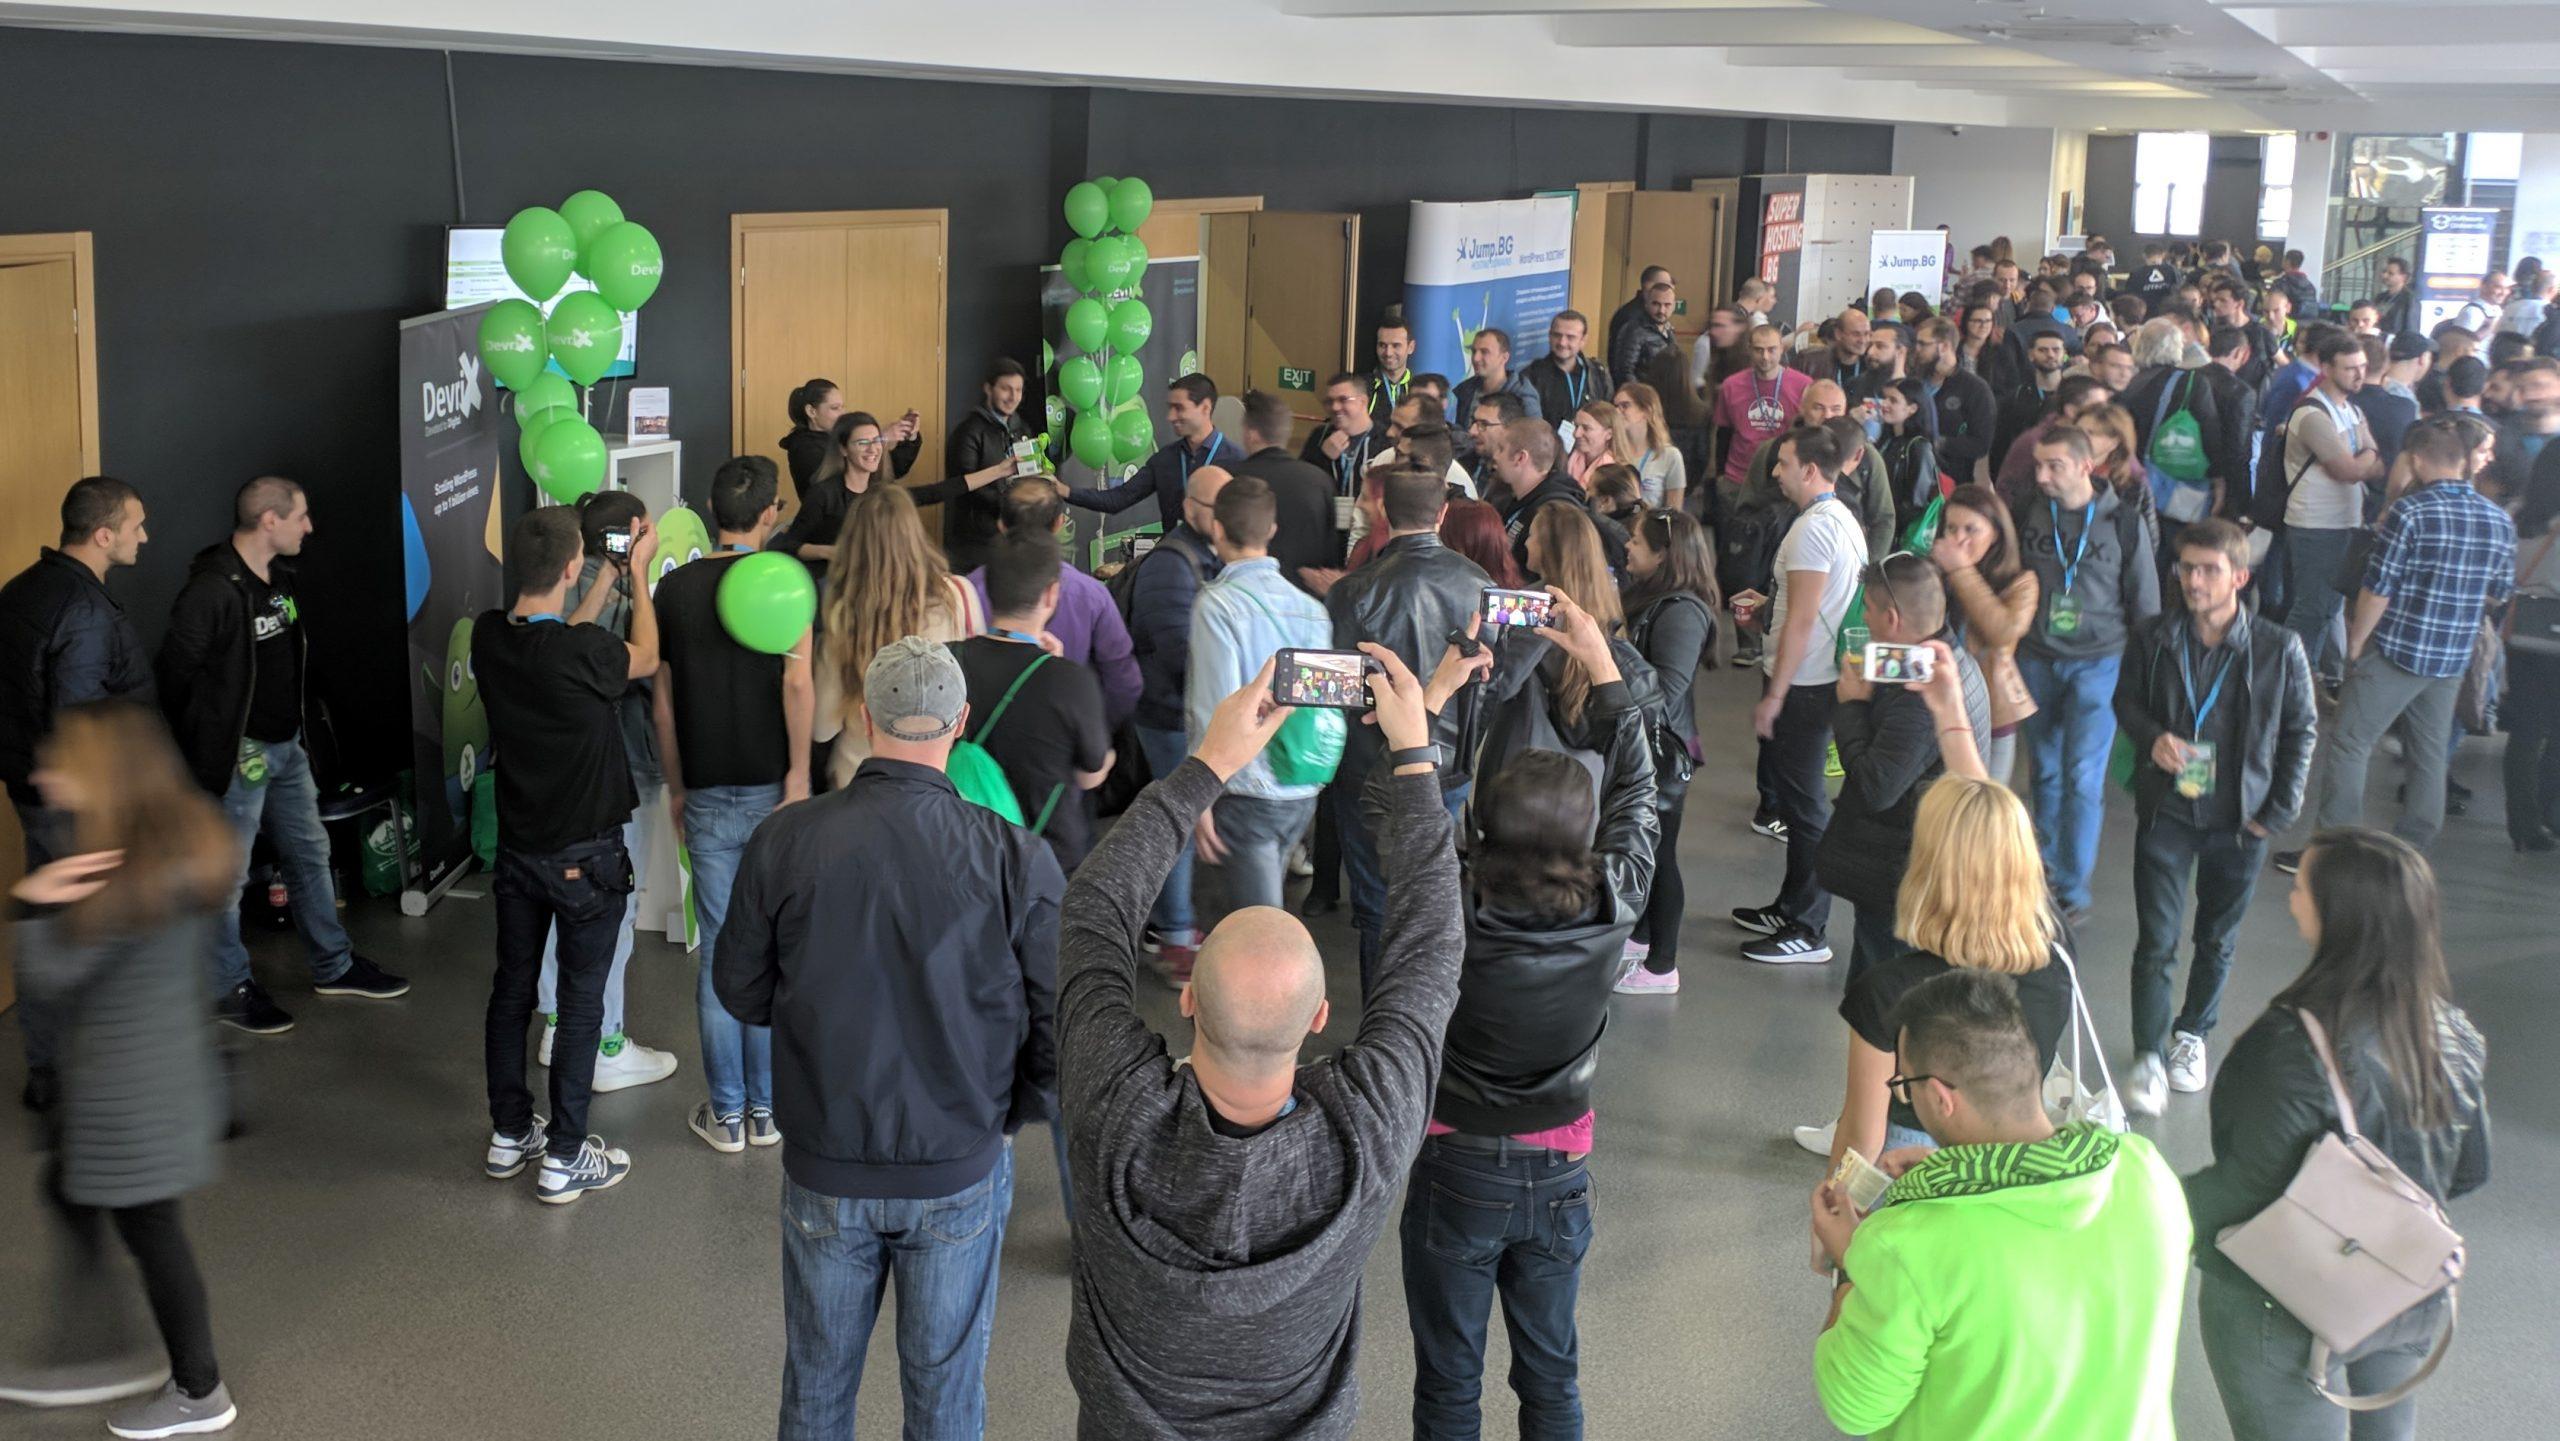 All eyes on DevriX stand on WCSOF 2019